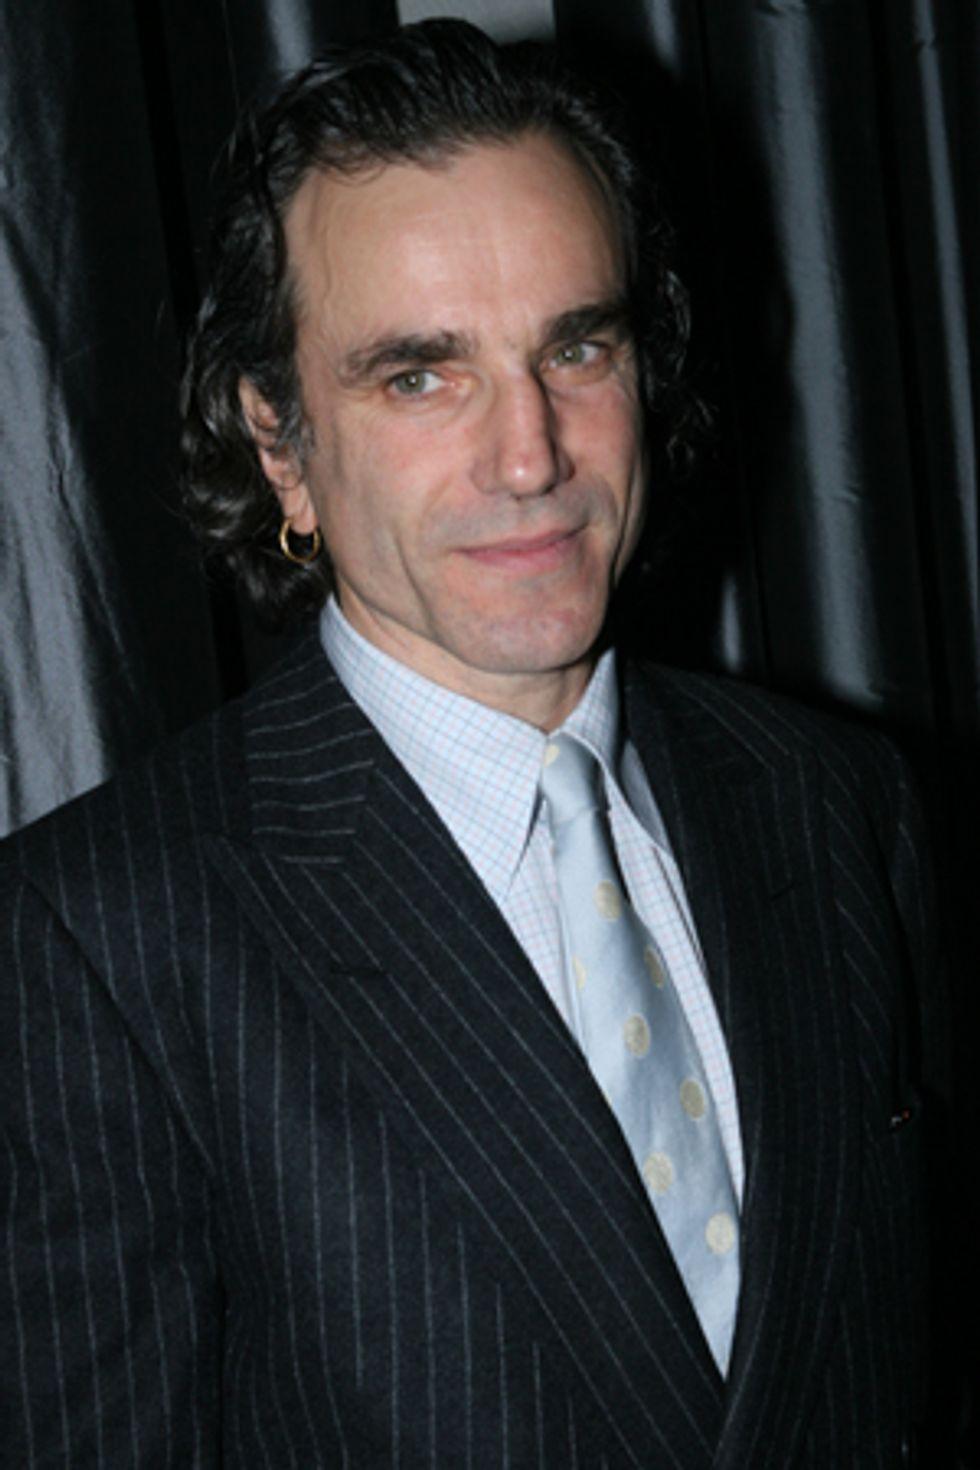 About Last Night... The New York Film Critics Circle Awards